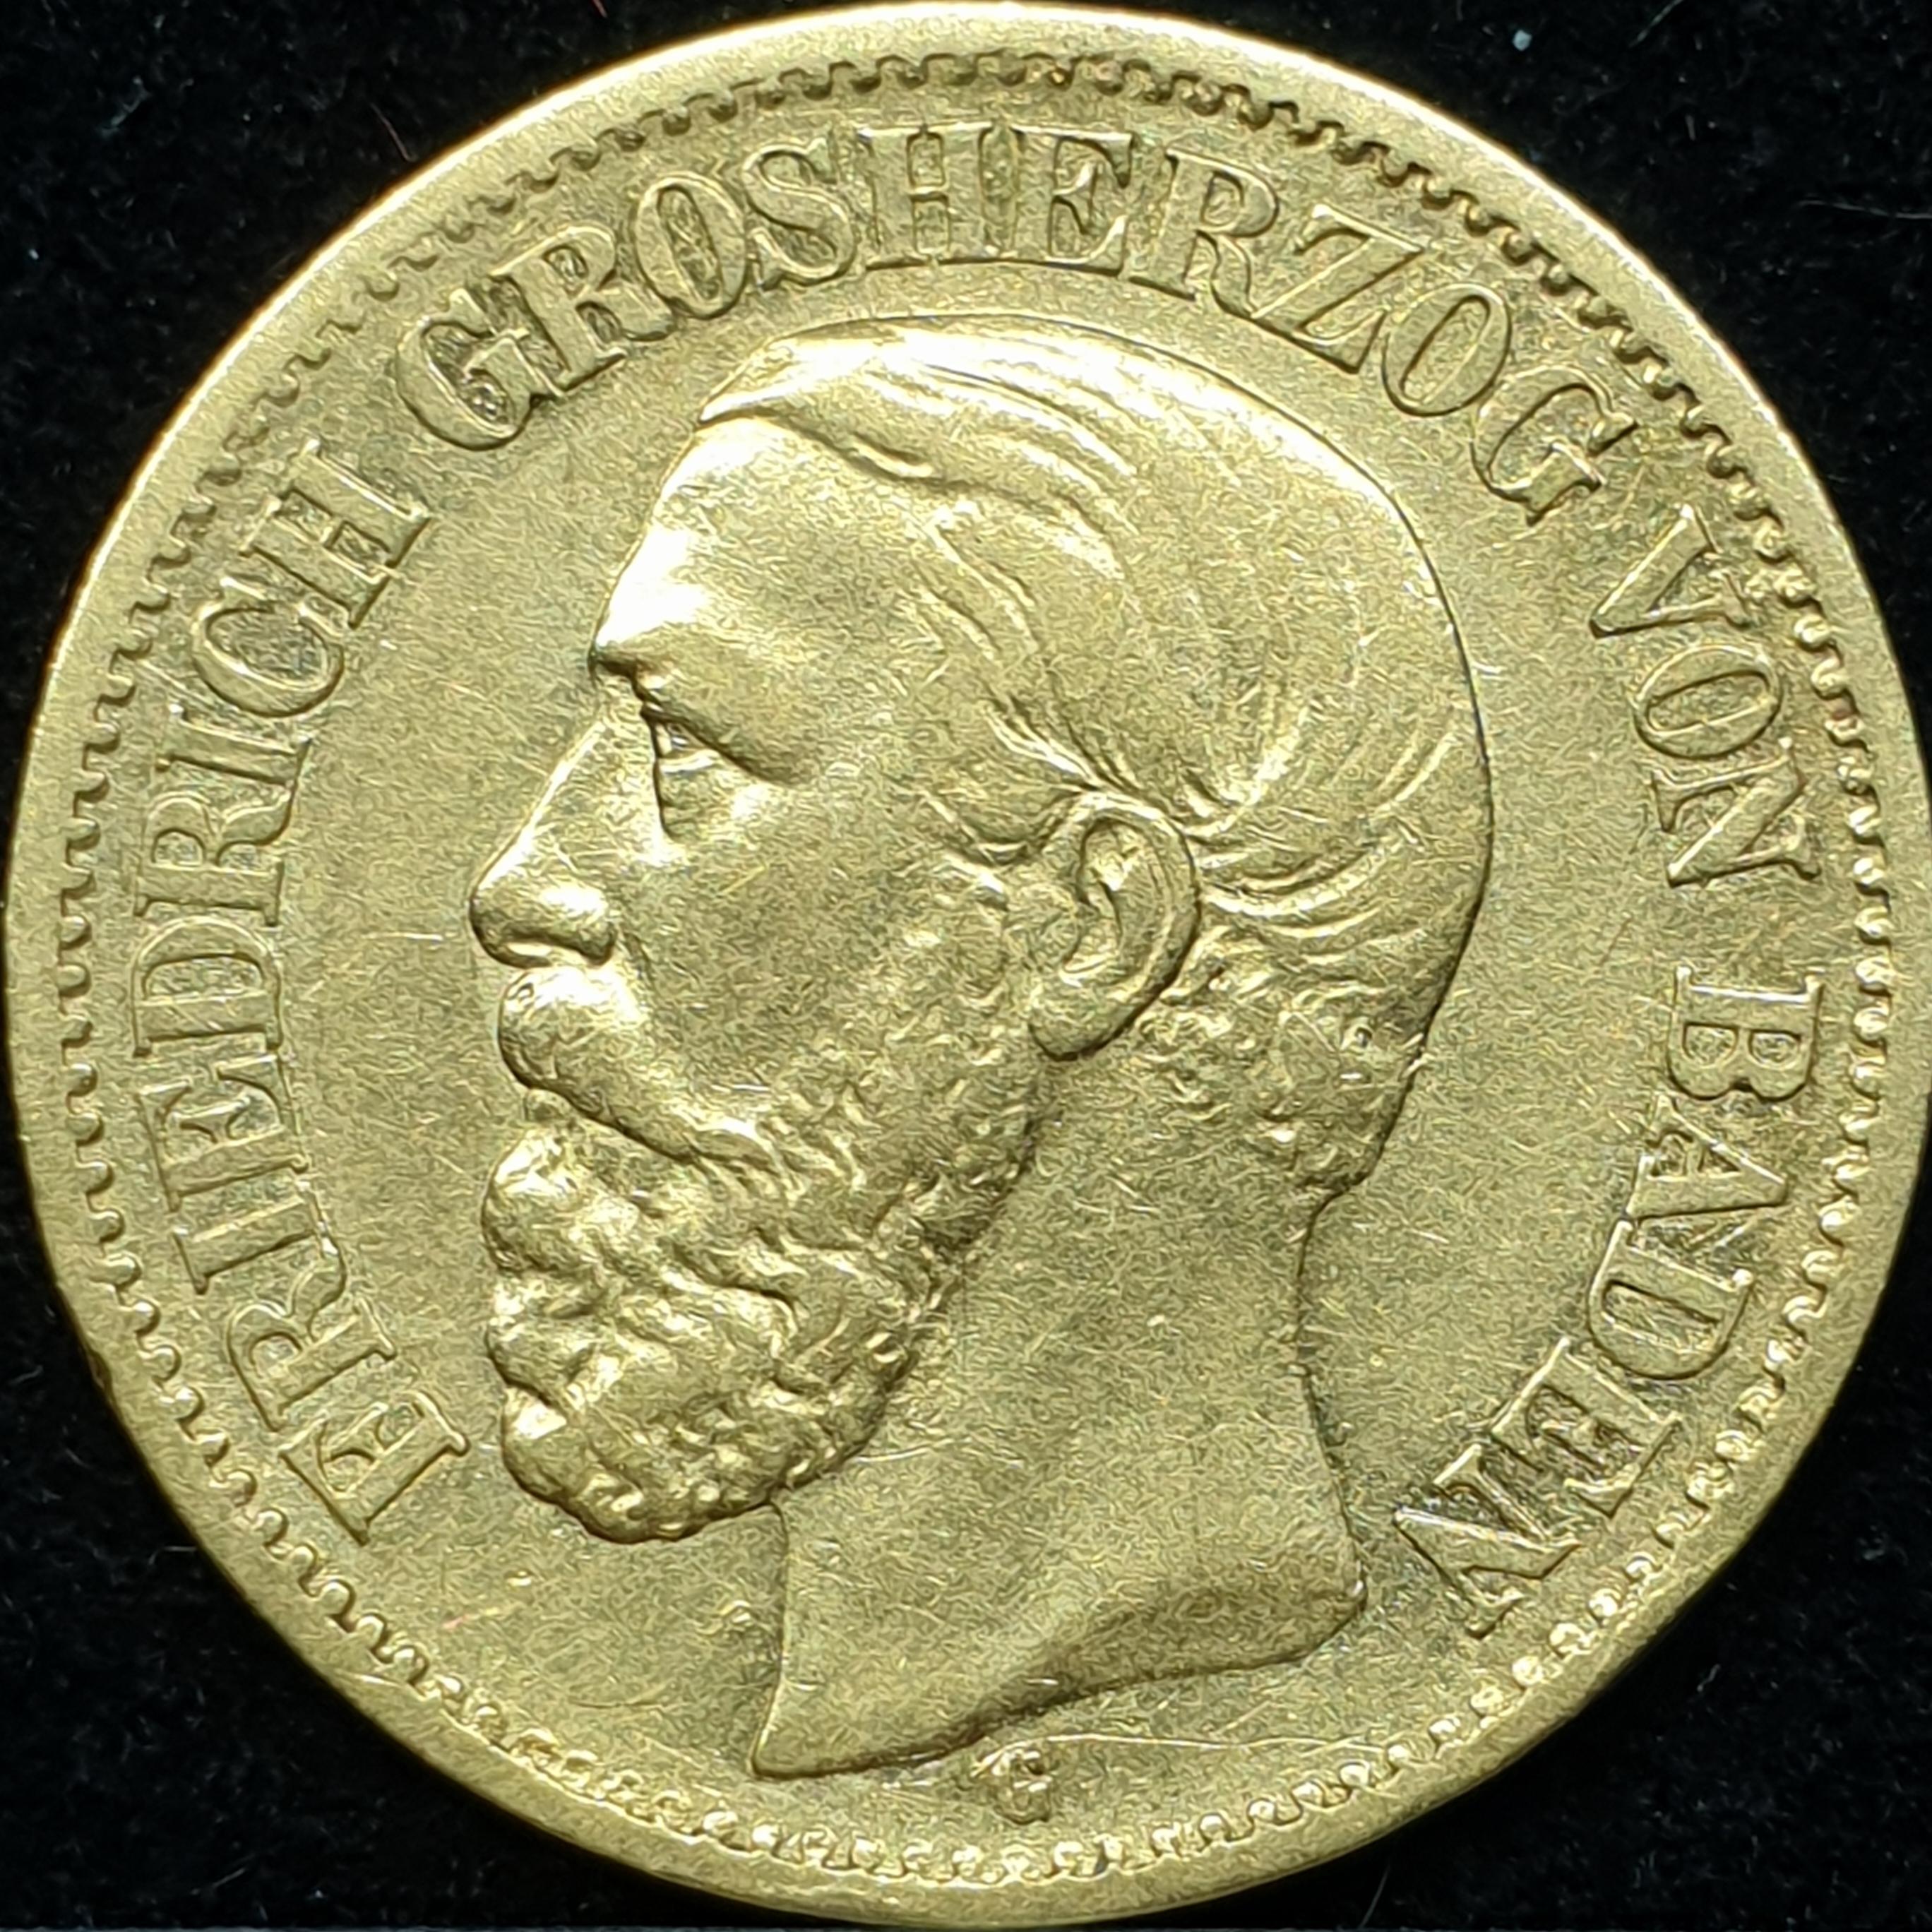 Germany - Baden - 10 mark - 1873 - 'Friedrich I'